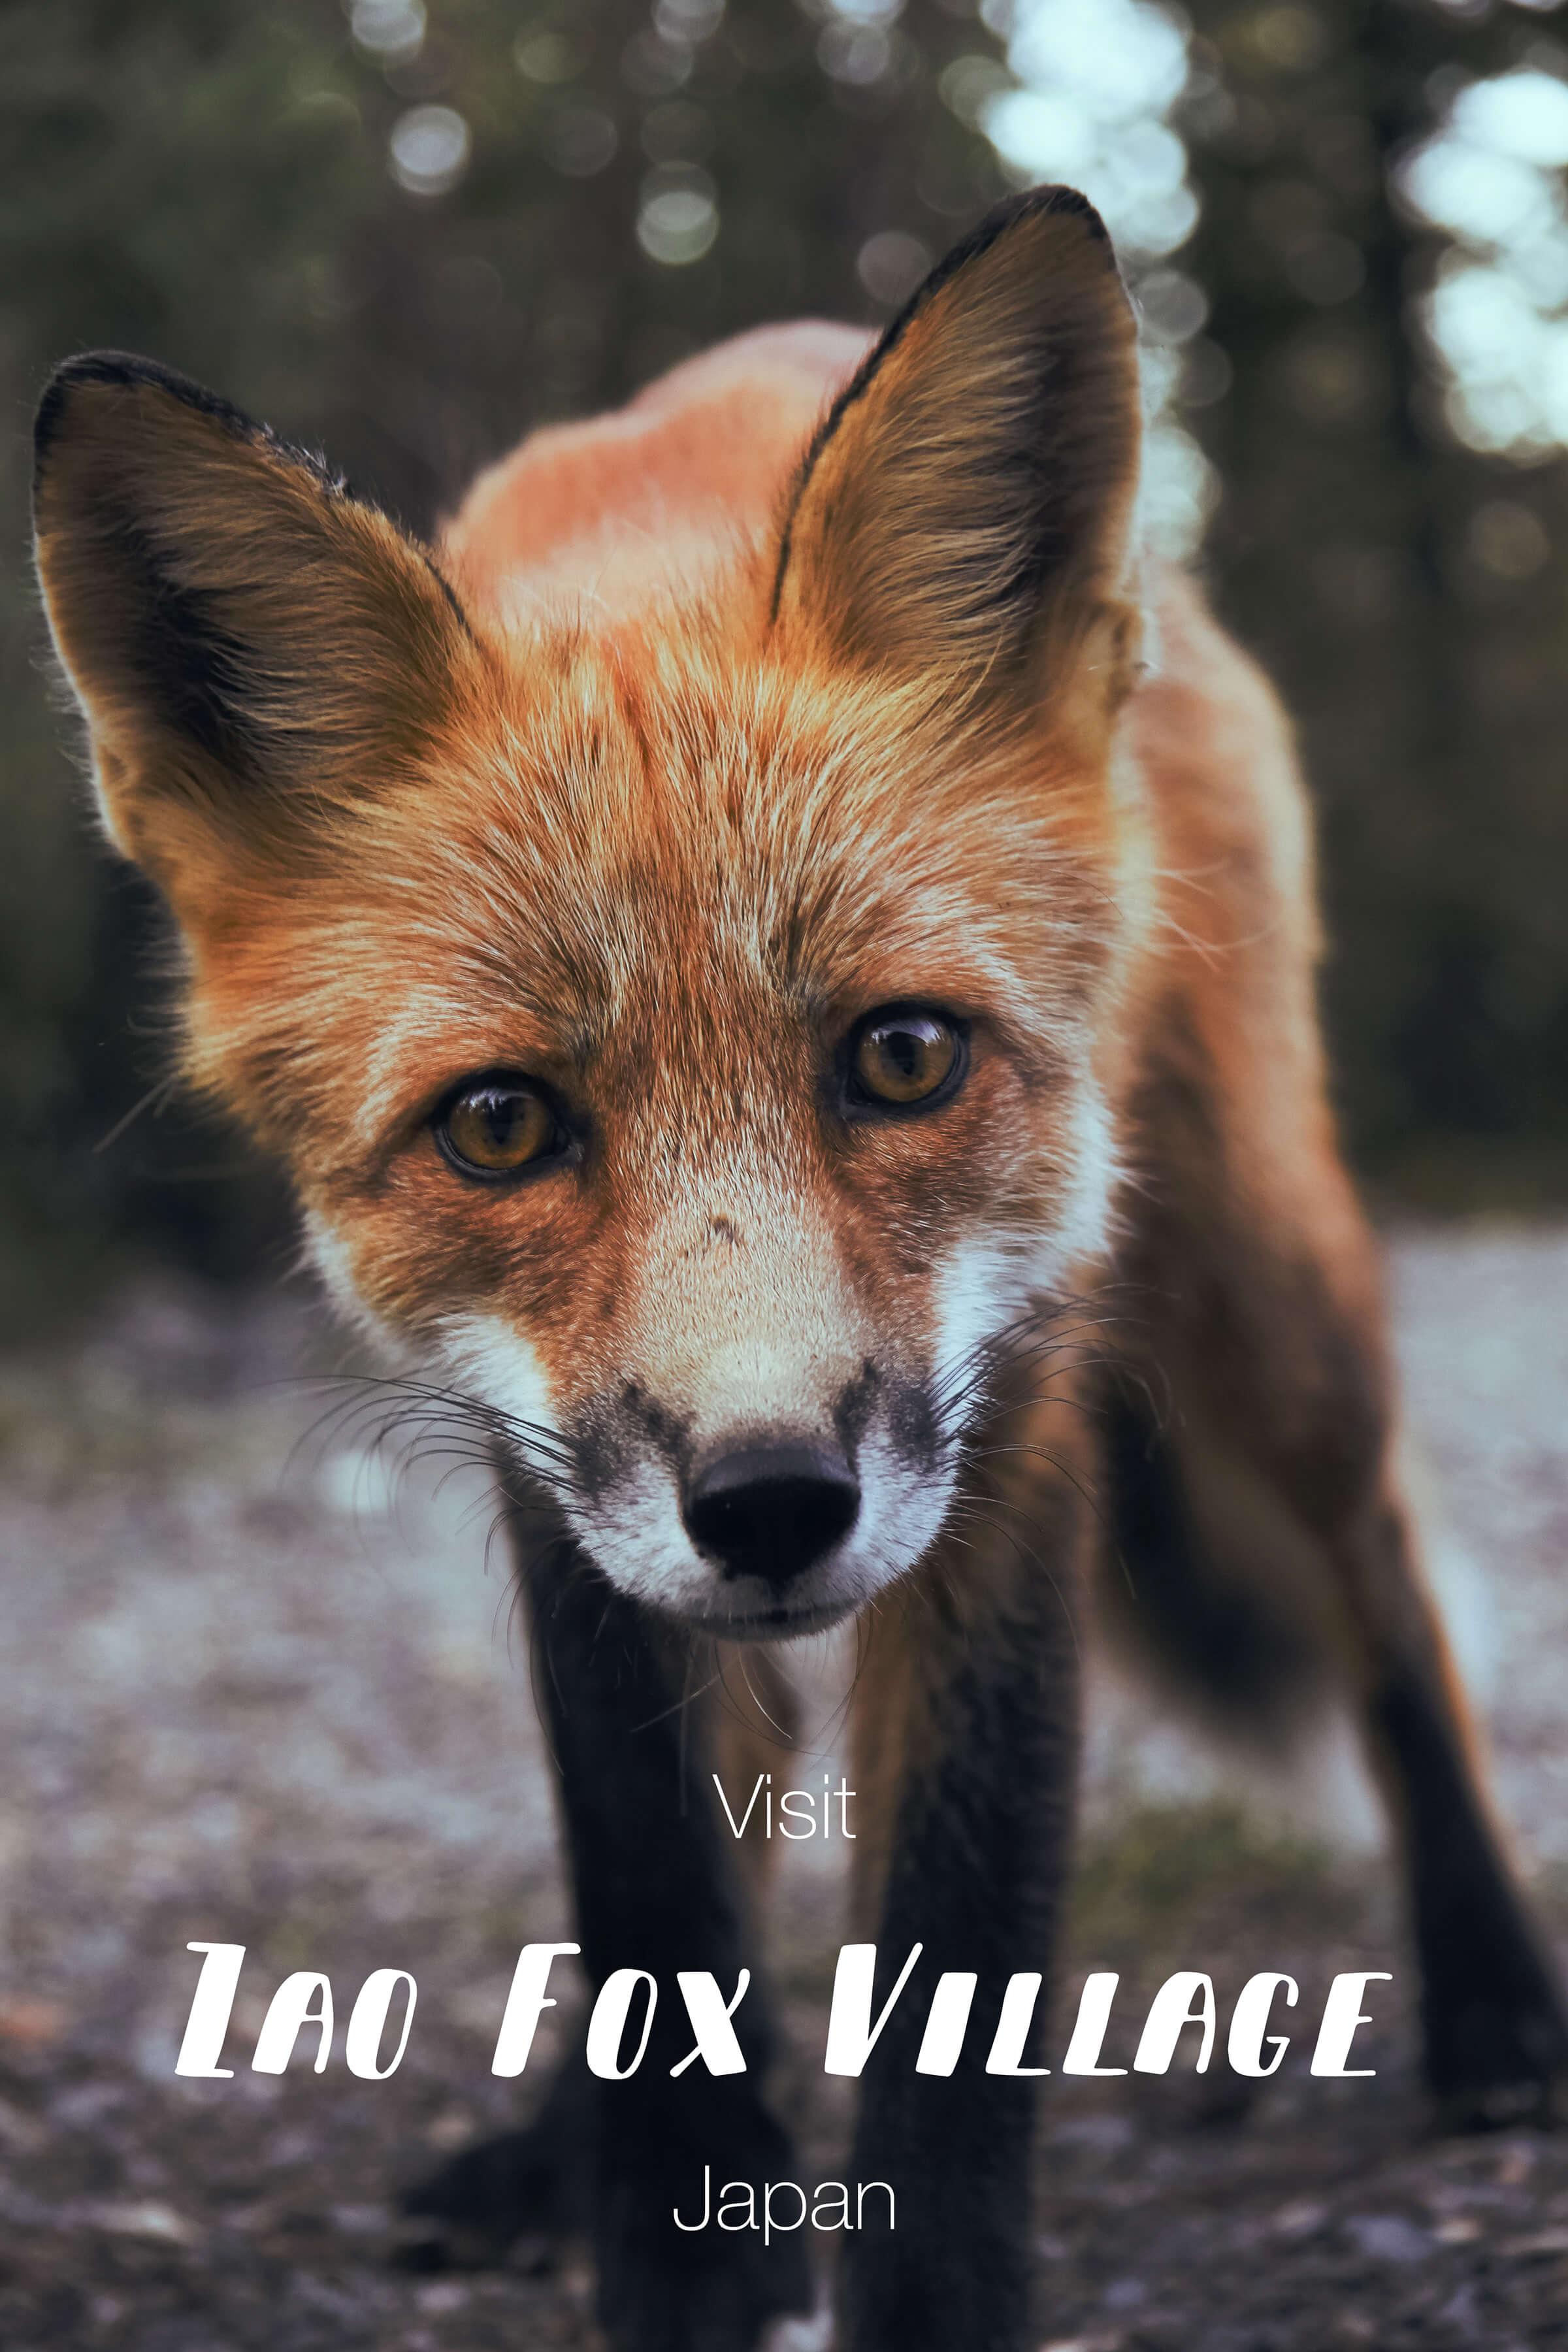 Zao-fox-village-japan.jpg